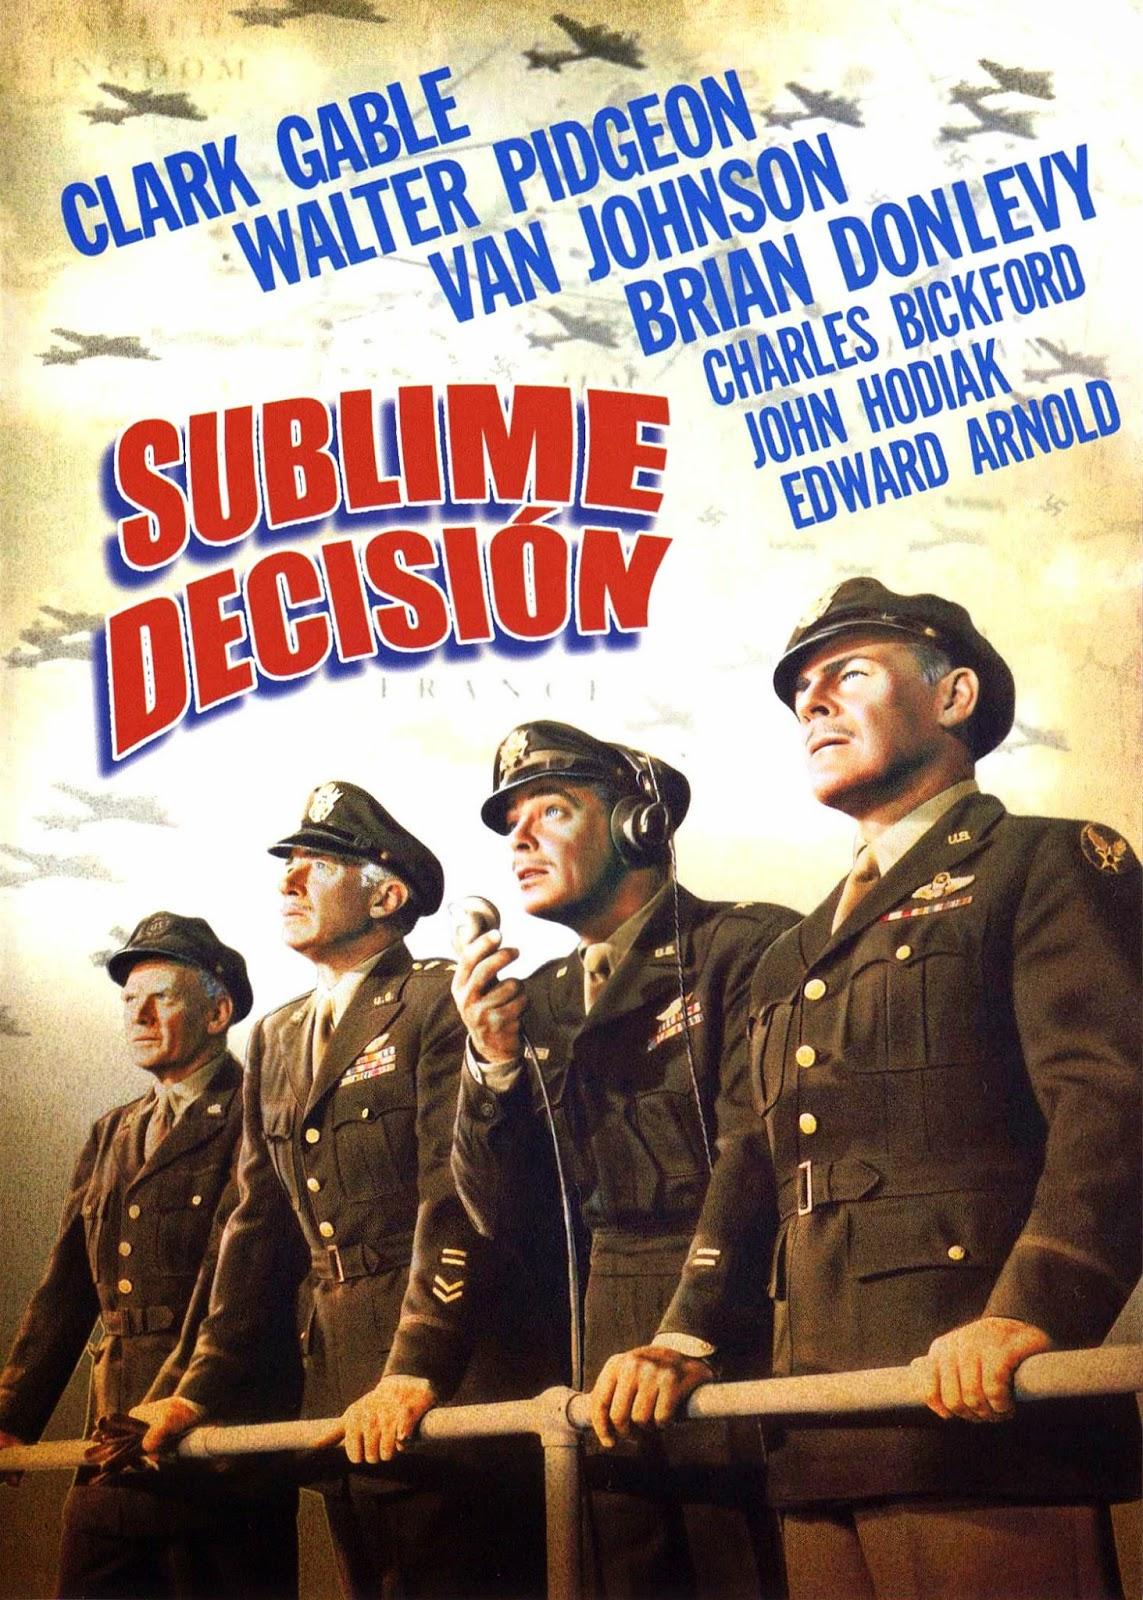 Sublime decisión (1948) Bélica